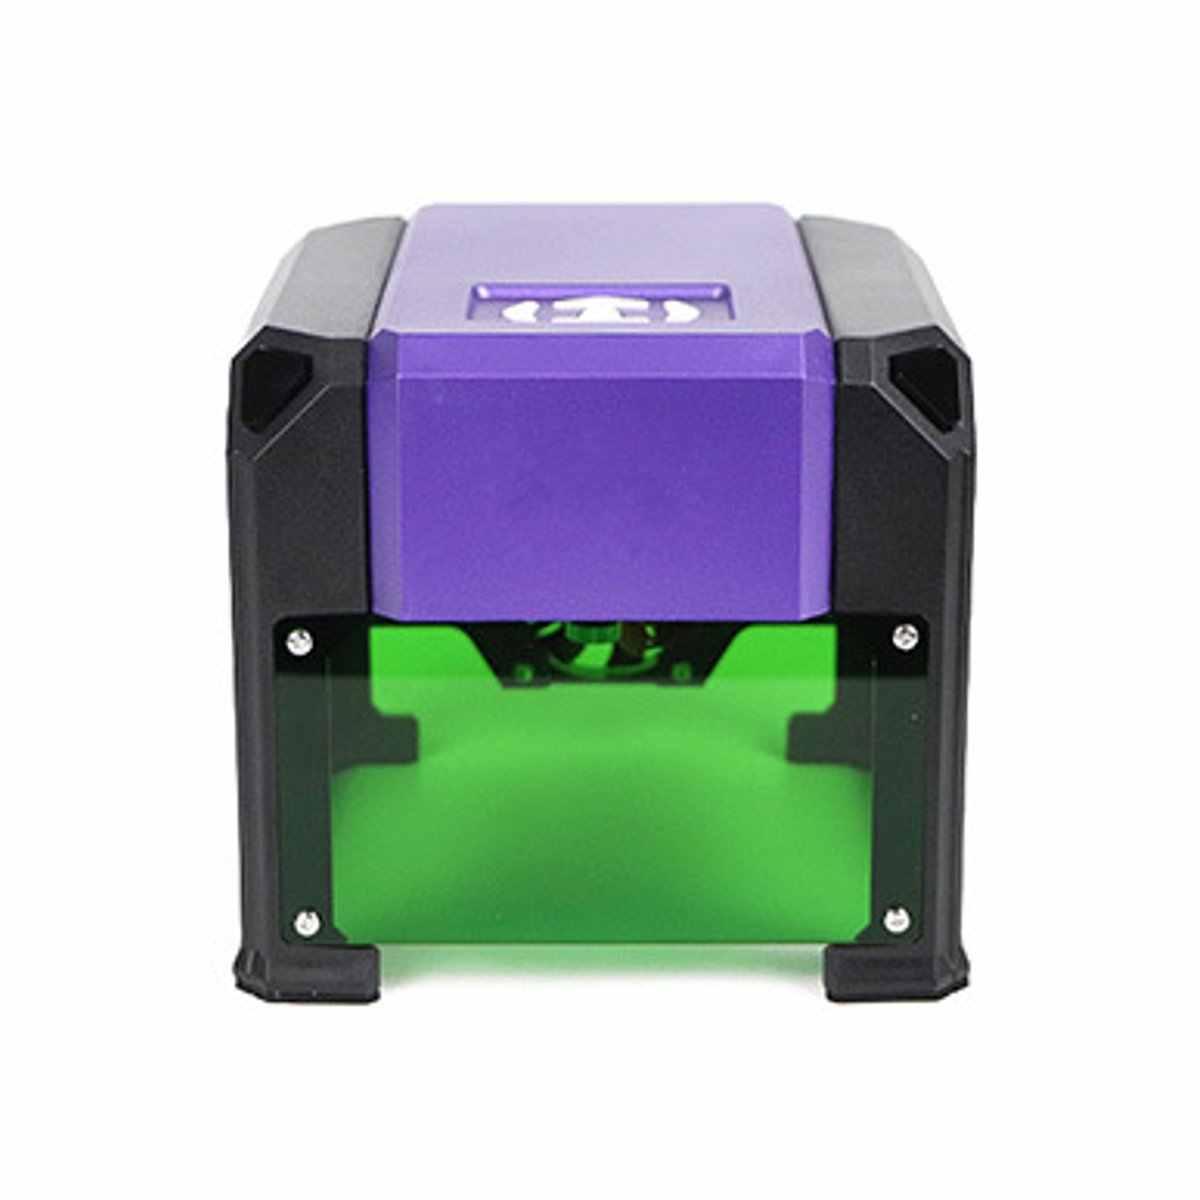 Upgrade Bluetooth Mini 3000MW Paars CNC Laser Graveermachine AC 110-220V DIY Graveur Desktop Hout Router /snijder/Printer